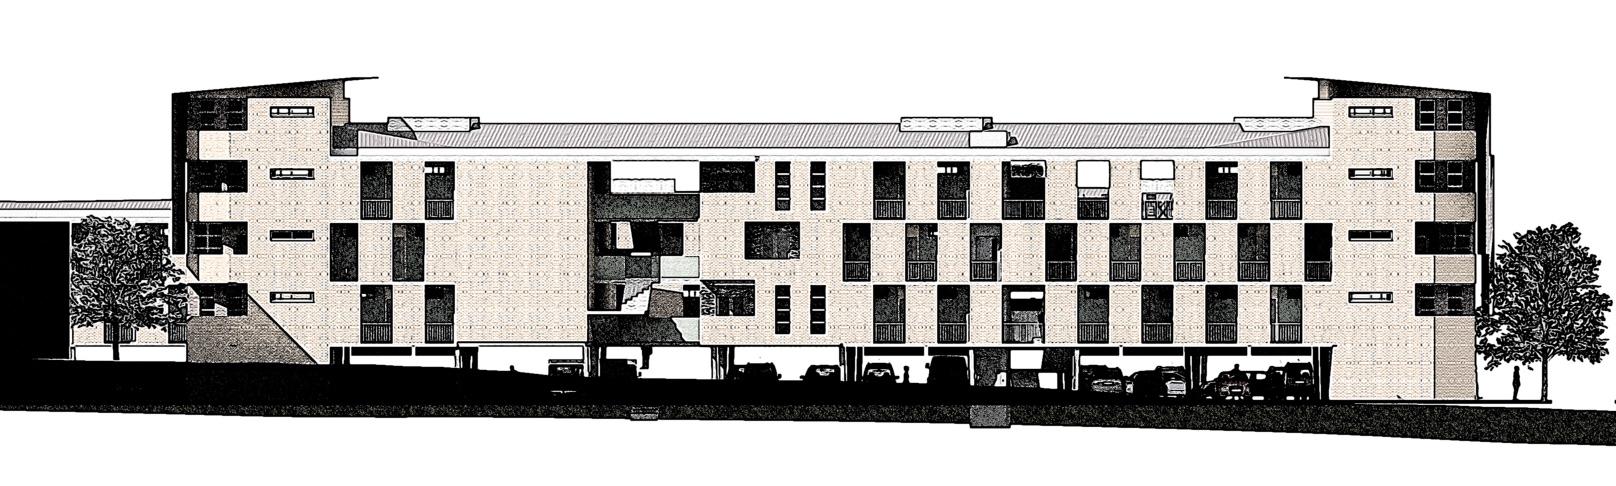 Housing - 2020